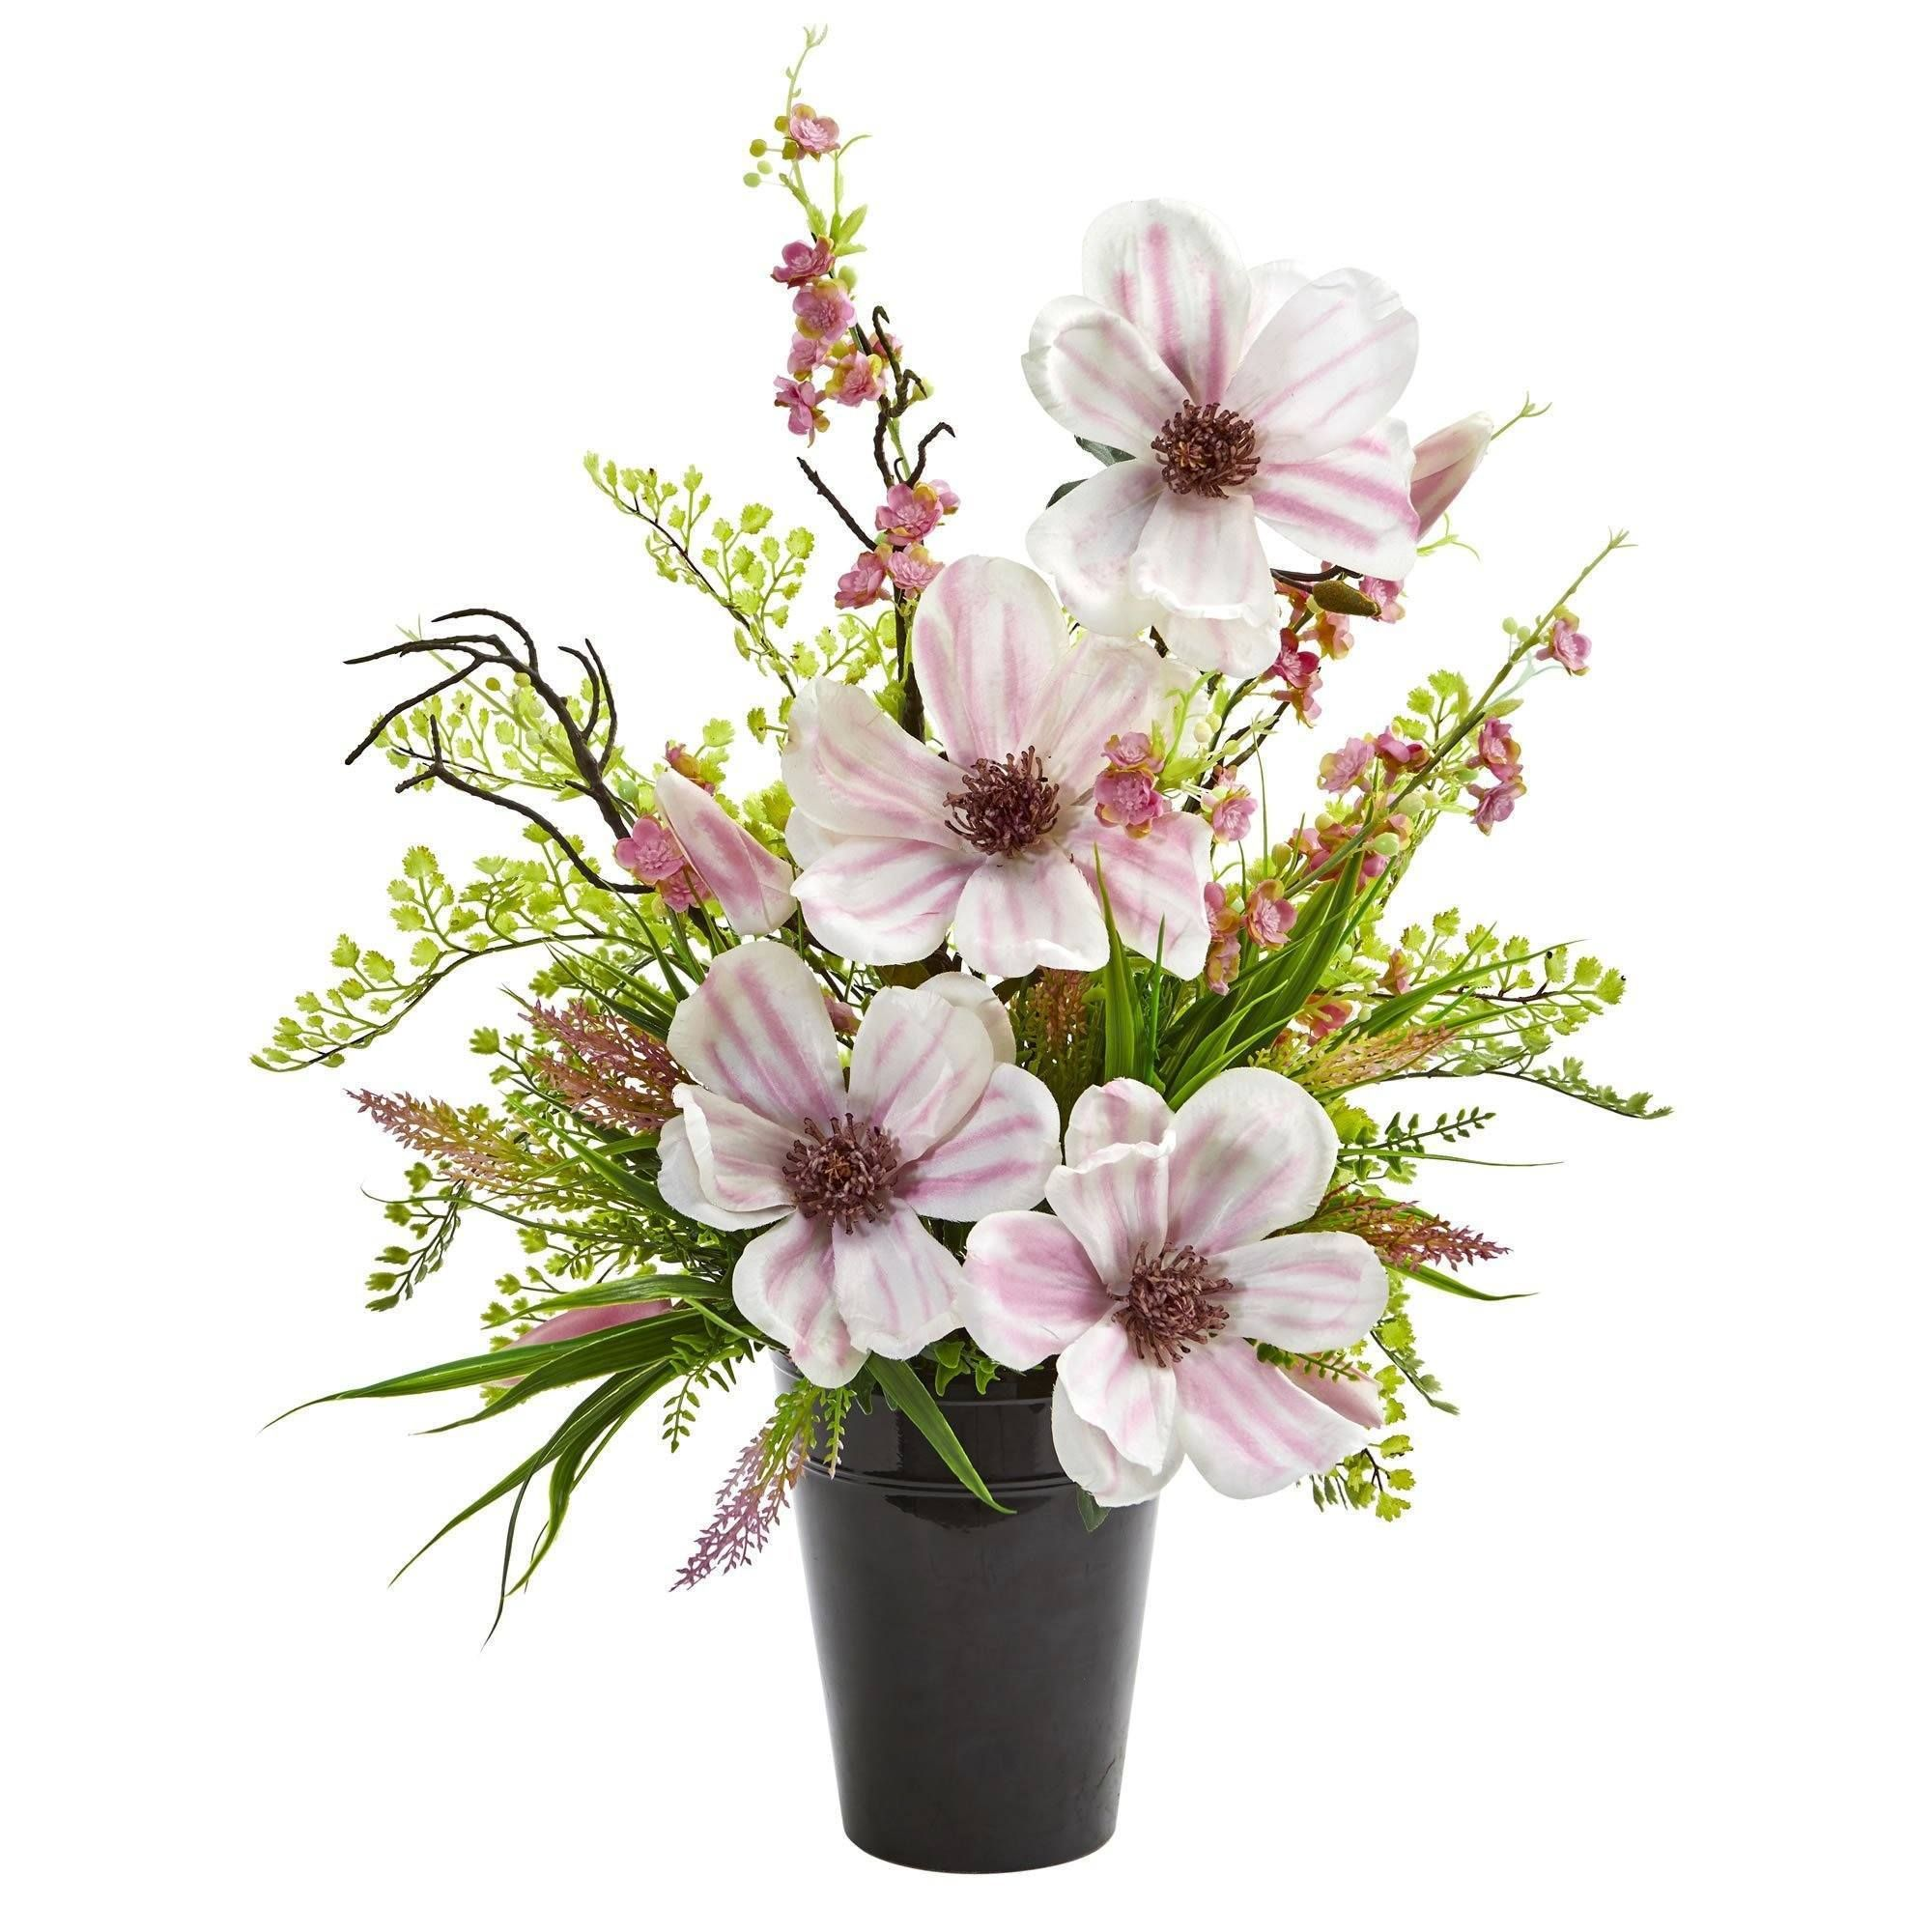 Magnolias Cherry Blossom Artificial Arrangement In 2021 Hydrangea Arrangements Cherry Blossom Flowers Floral Arrangements